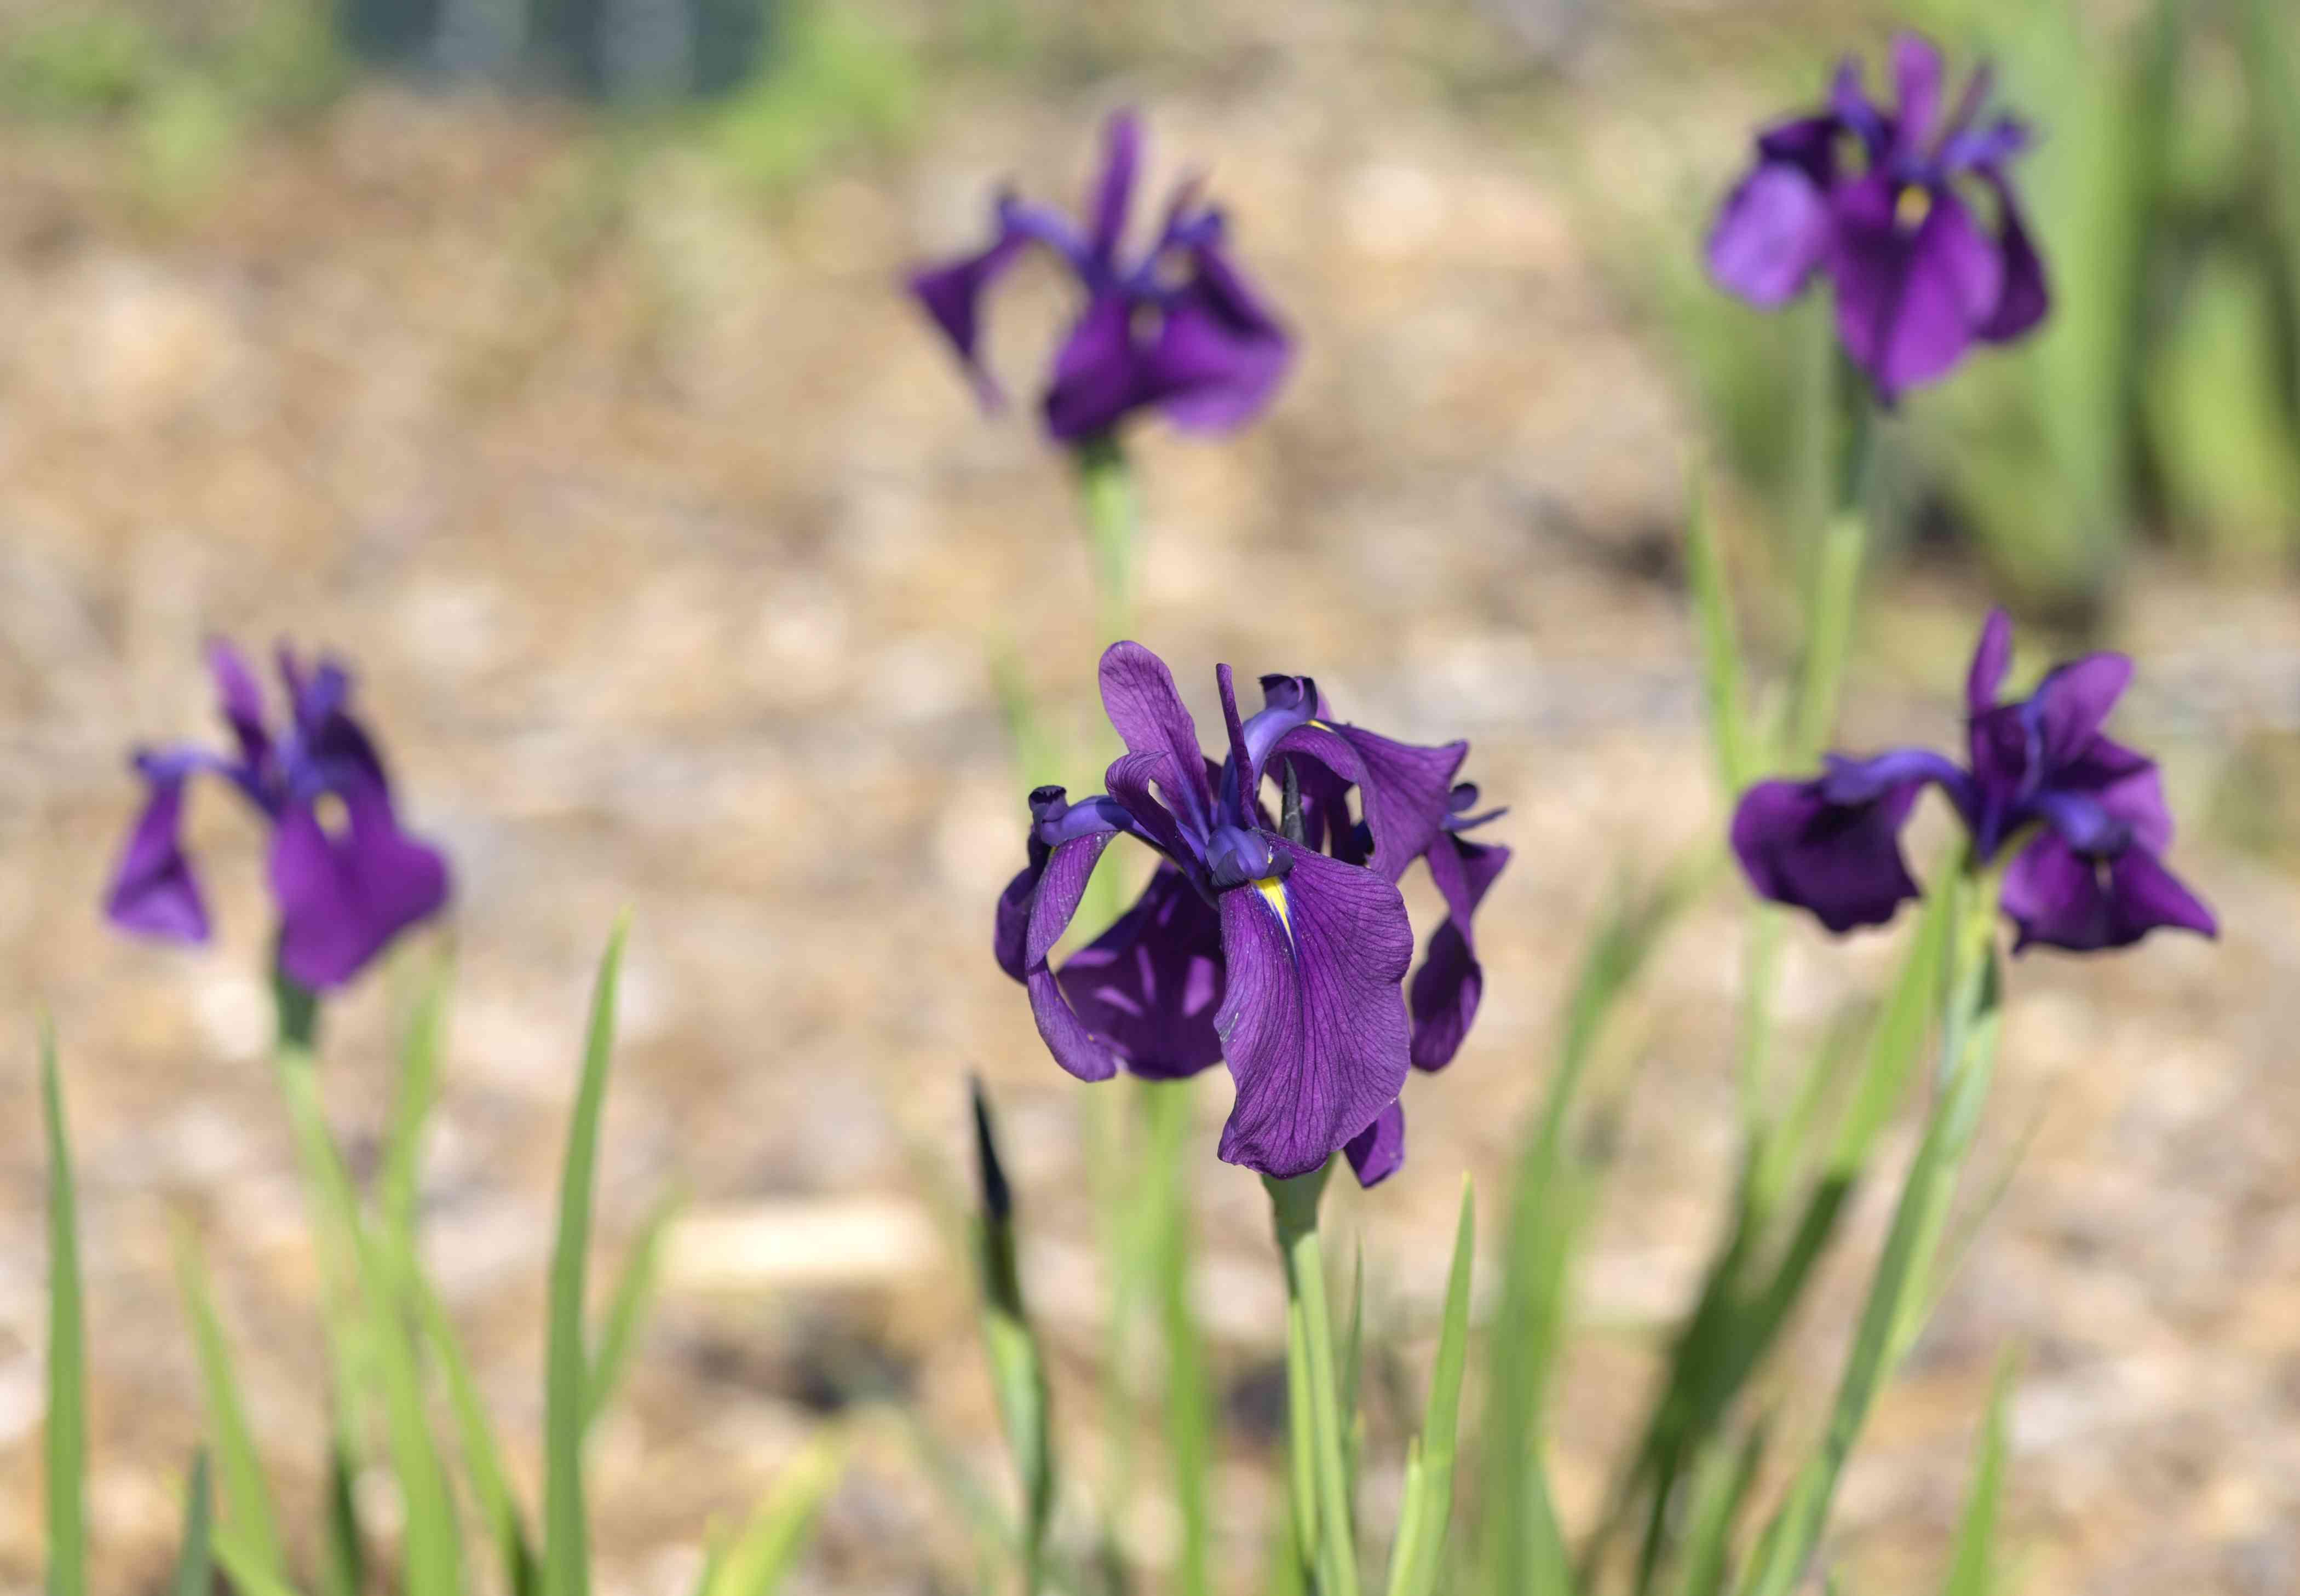 Japanese iris plant with dark purple flowers on thin stems and blade-like leaves